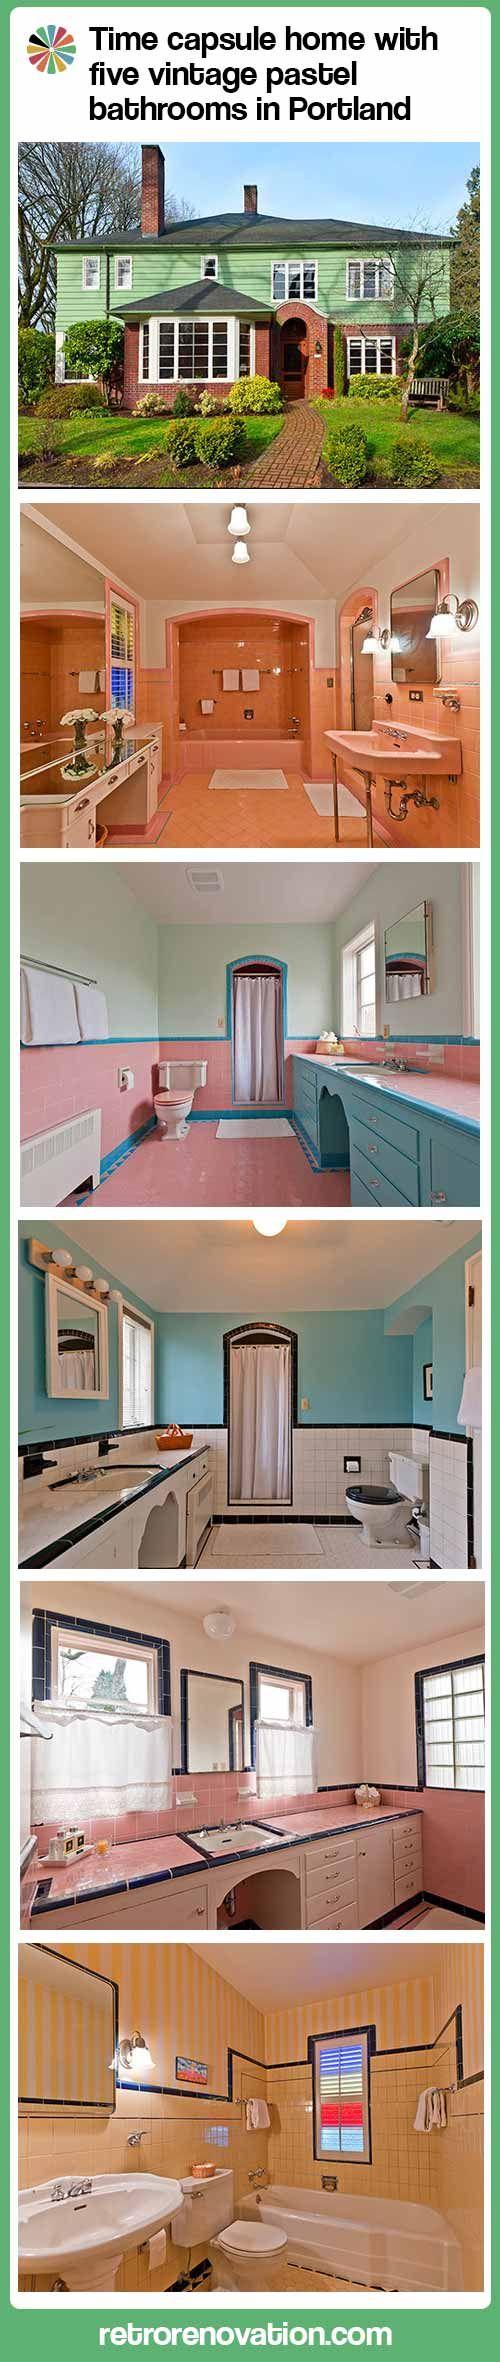 Five vintage pastel bathrooms in this lovely 1942 capsule house -- Portland, Oregon -- 13 photos - Retro Renovation